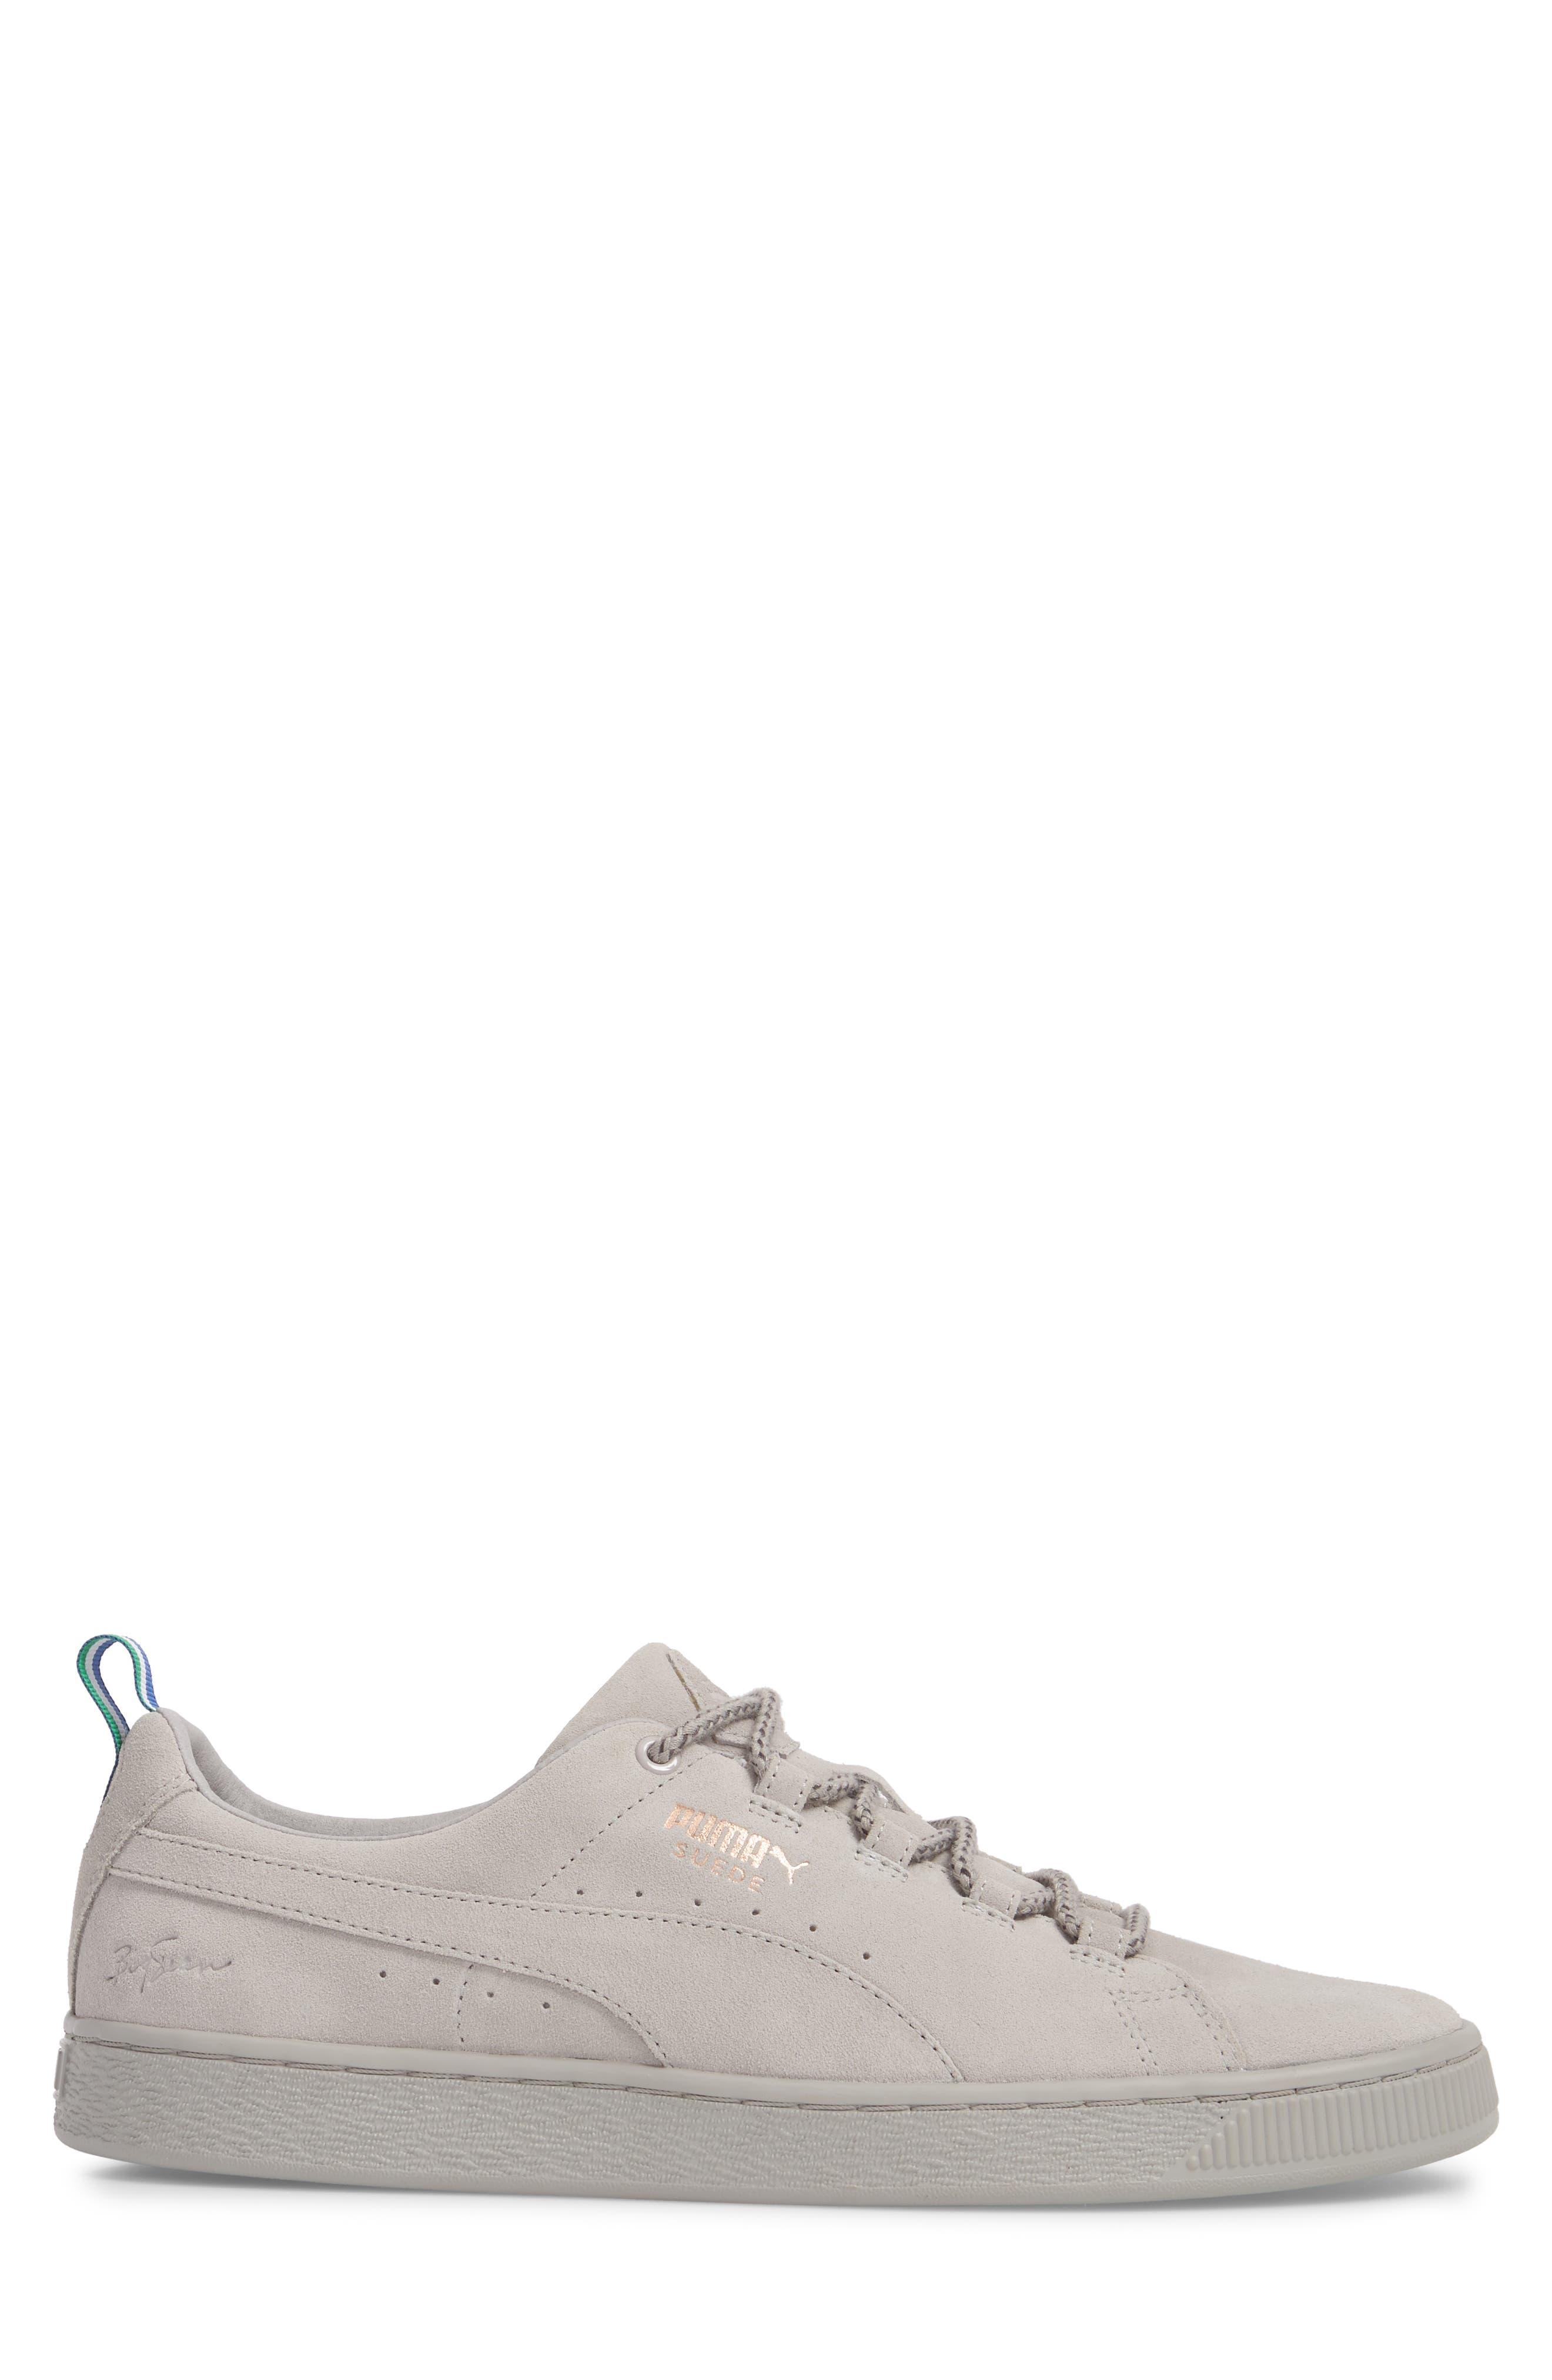 x Big Sean Suede Sneaker,                             Alternate thumbnail 3, color,                             Ash Leather/ Suede